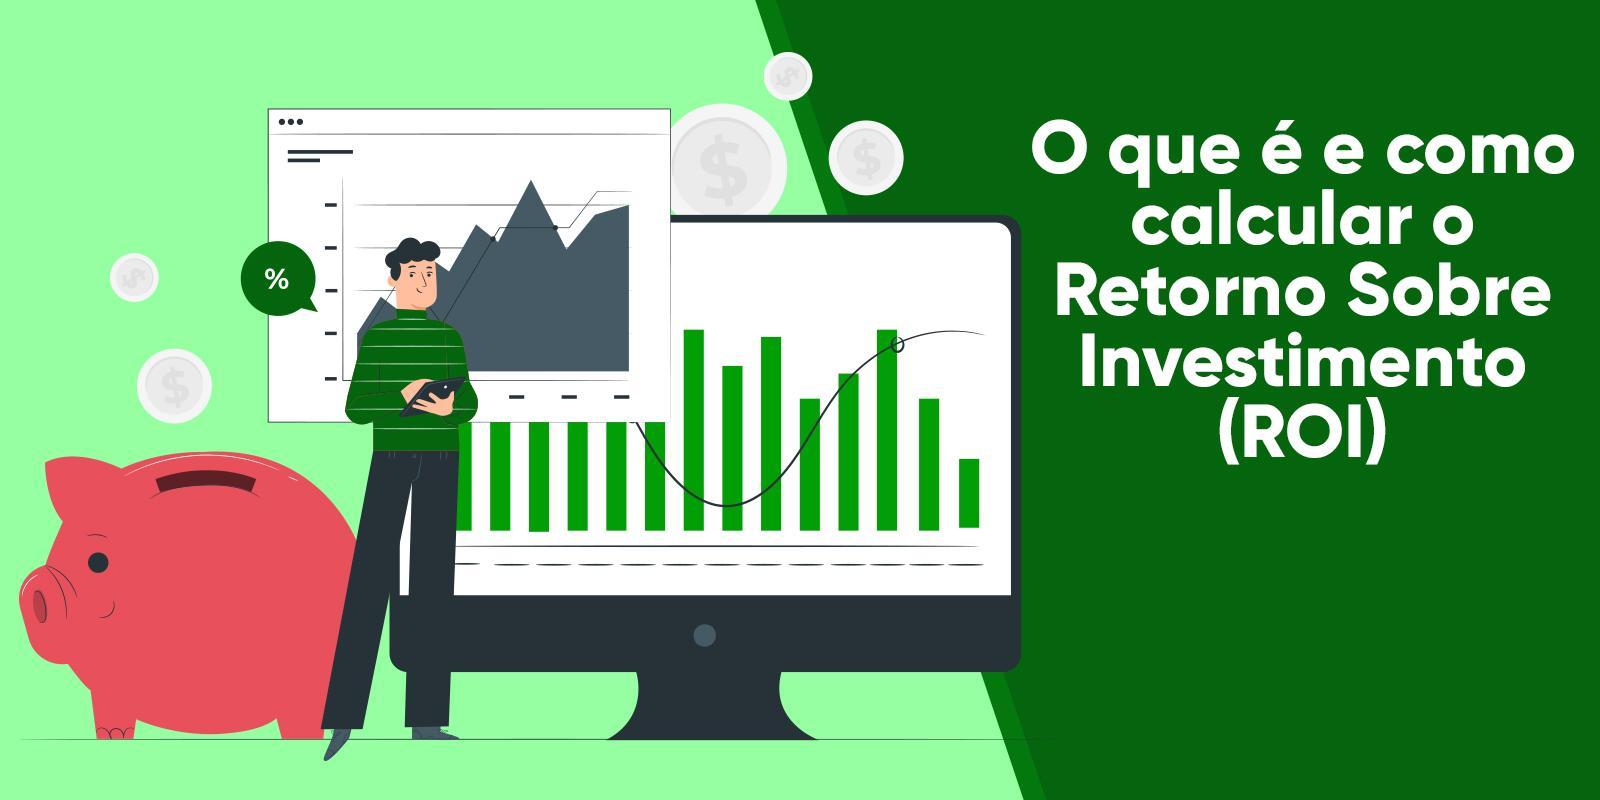 O que é e como calcular o Retorno Sobre Investimento (ROI)